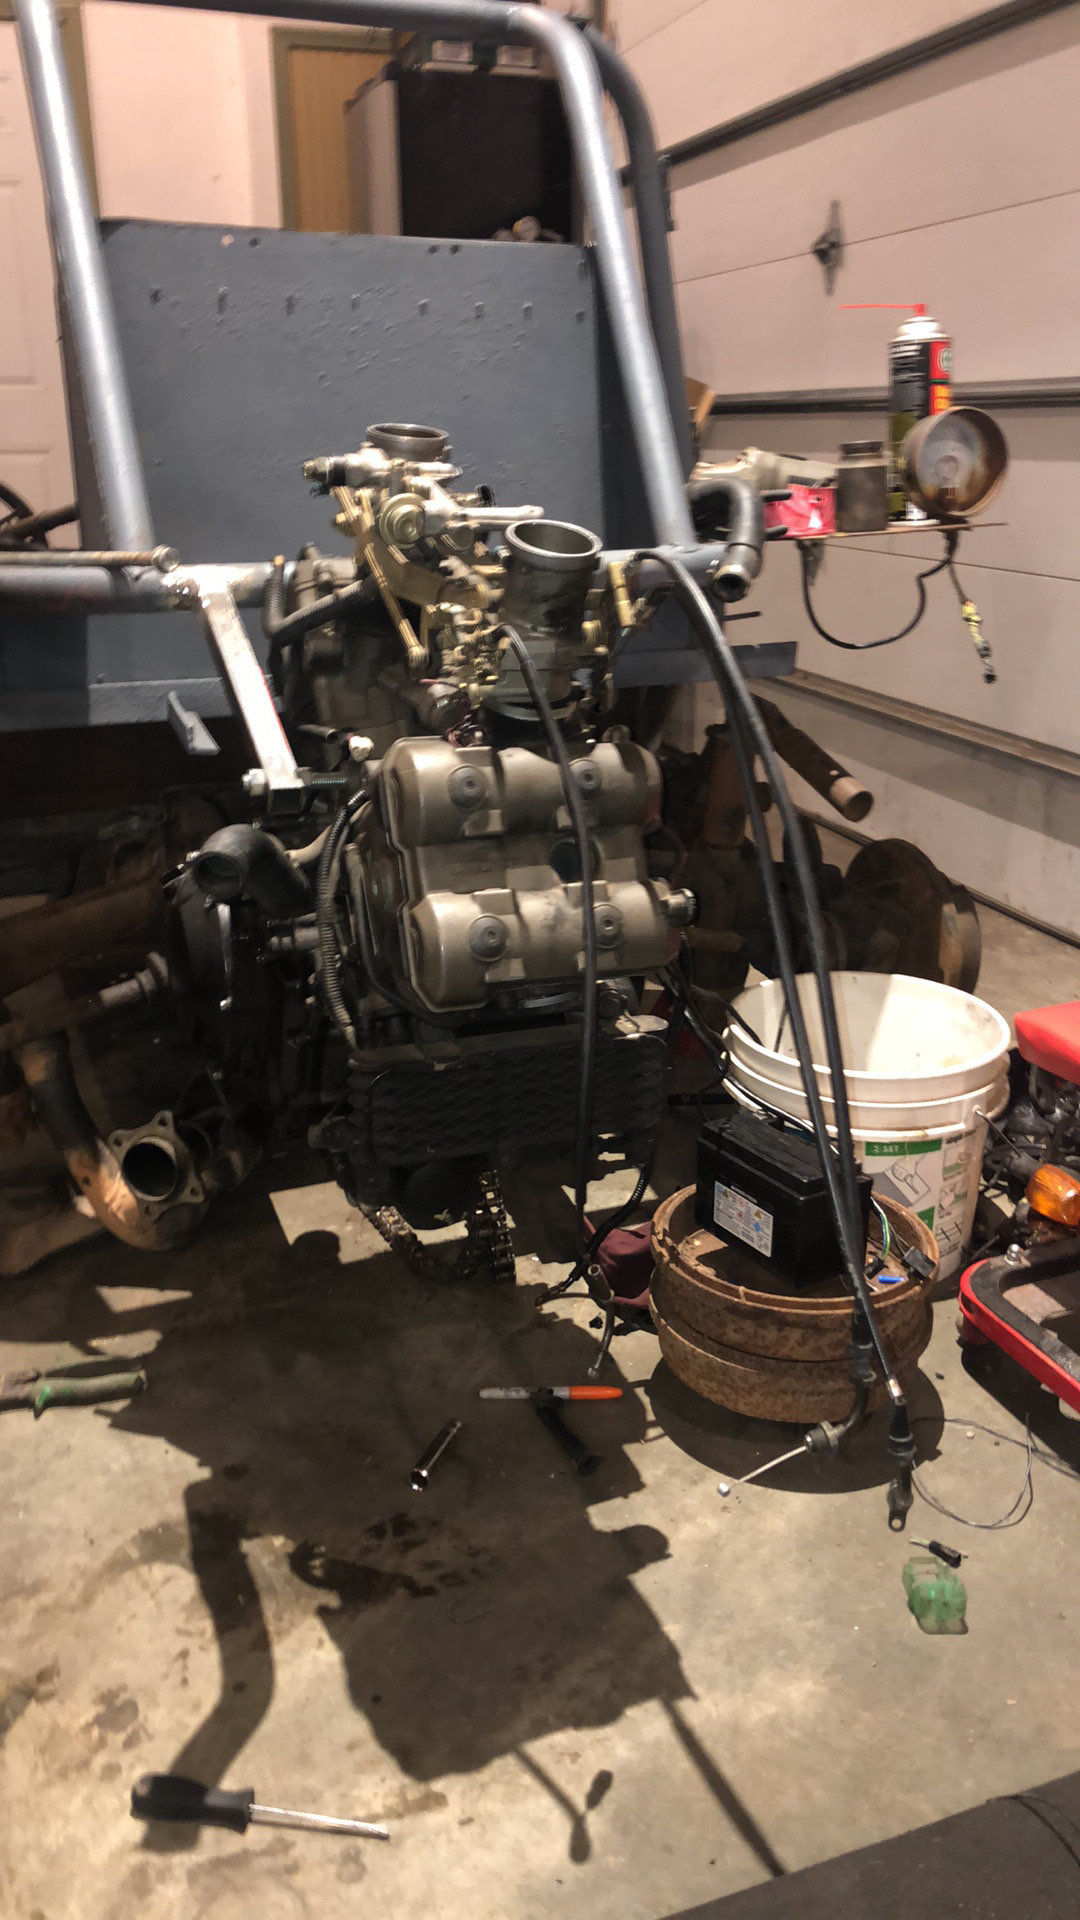 2001 tl1000s wiring issue on engine swap-cf2b339a-9d91-4dd2-80f6-c8cc4f7e040f_1574996961586.jpeg